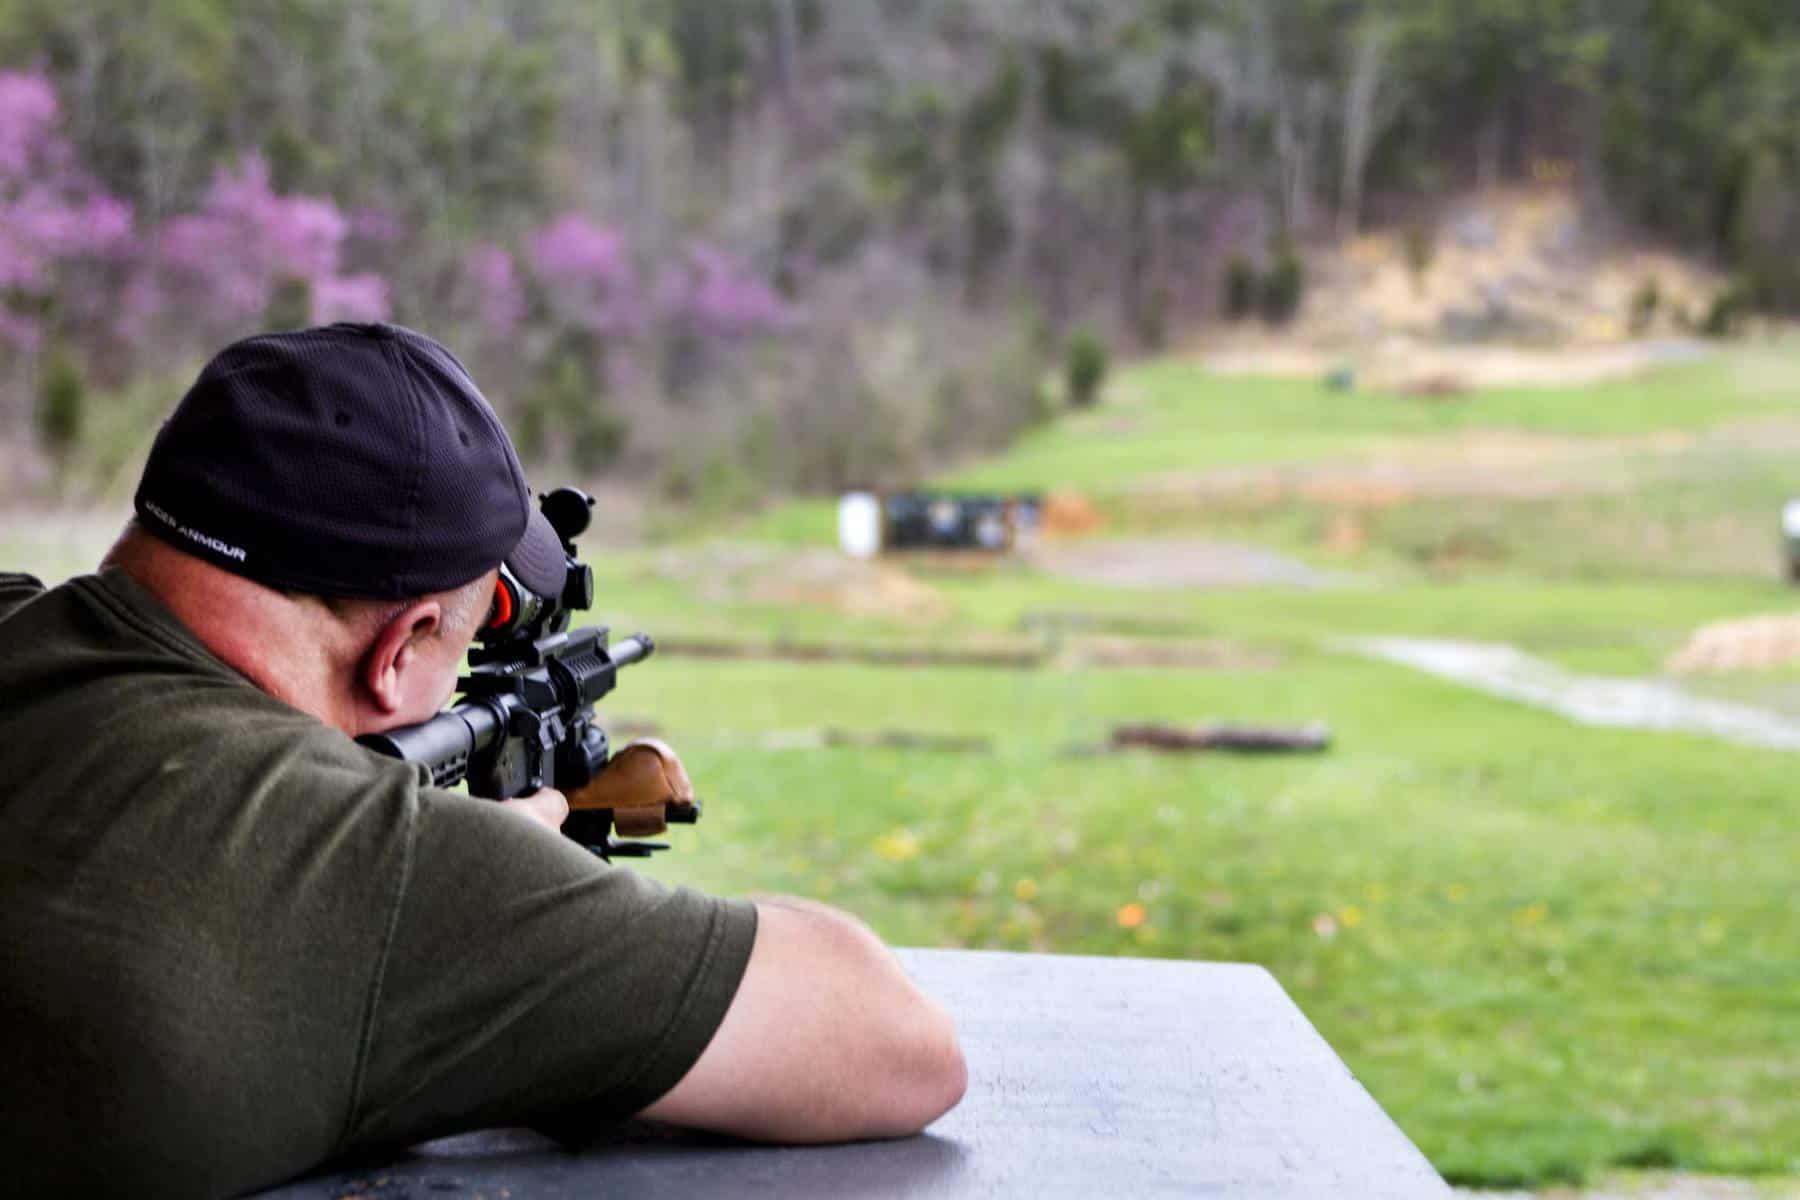 Cherokee Rod & Gun Club | Kingsport, TN | Shooting Range | Fishing Club